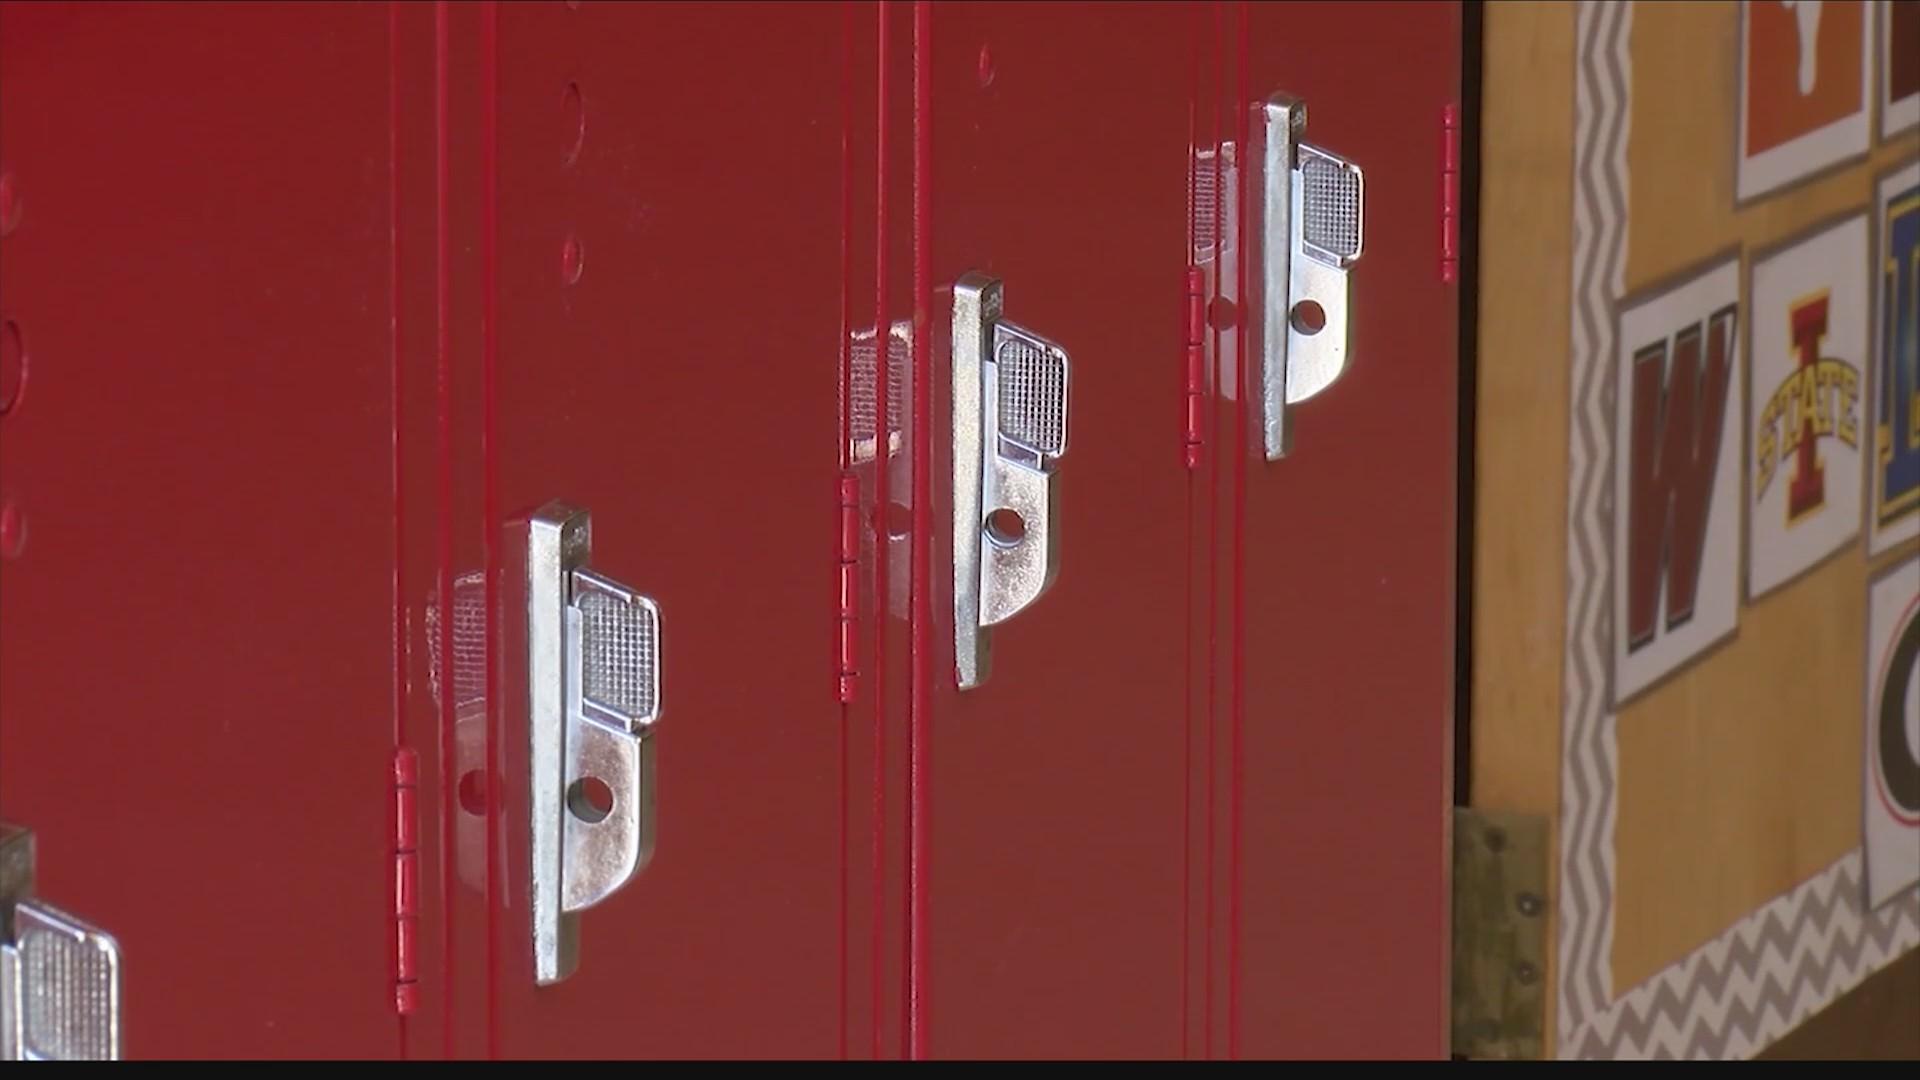 Increasing Number of Amarillo ISD Students Taking AP Exams